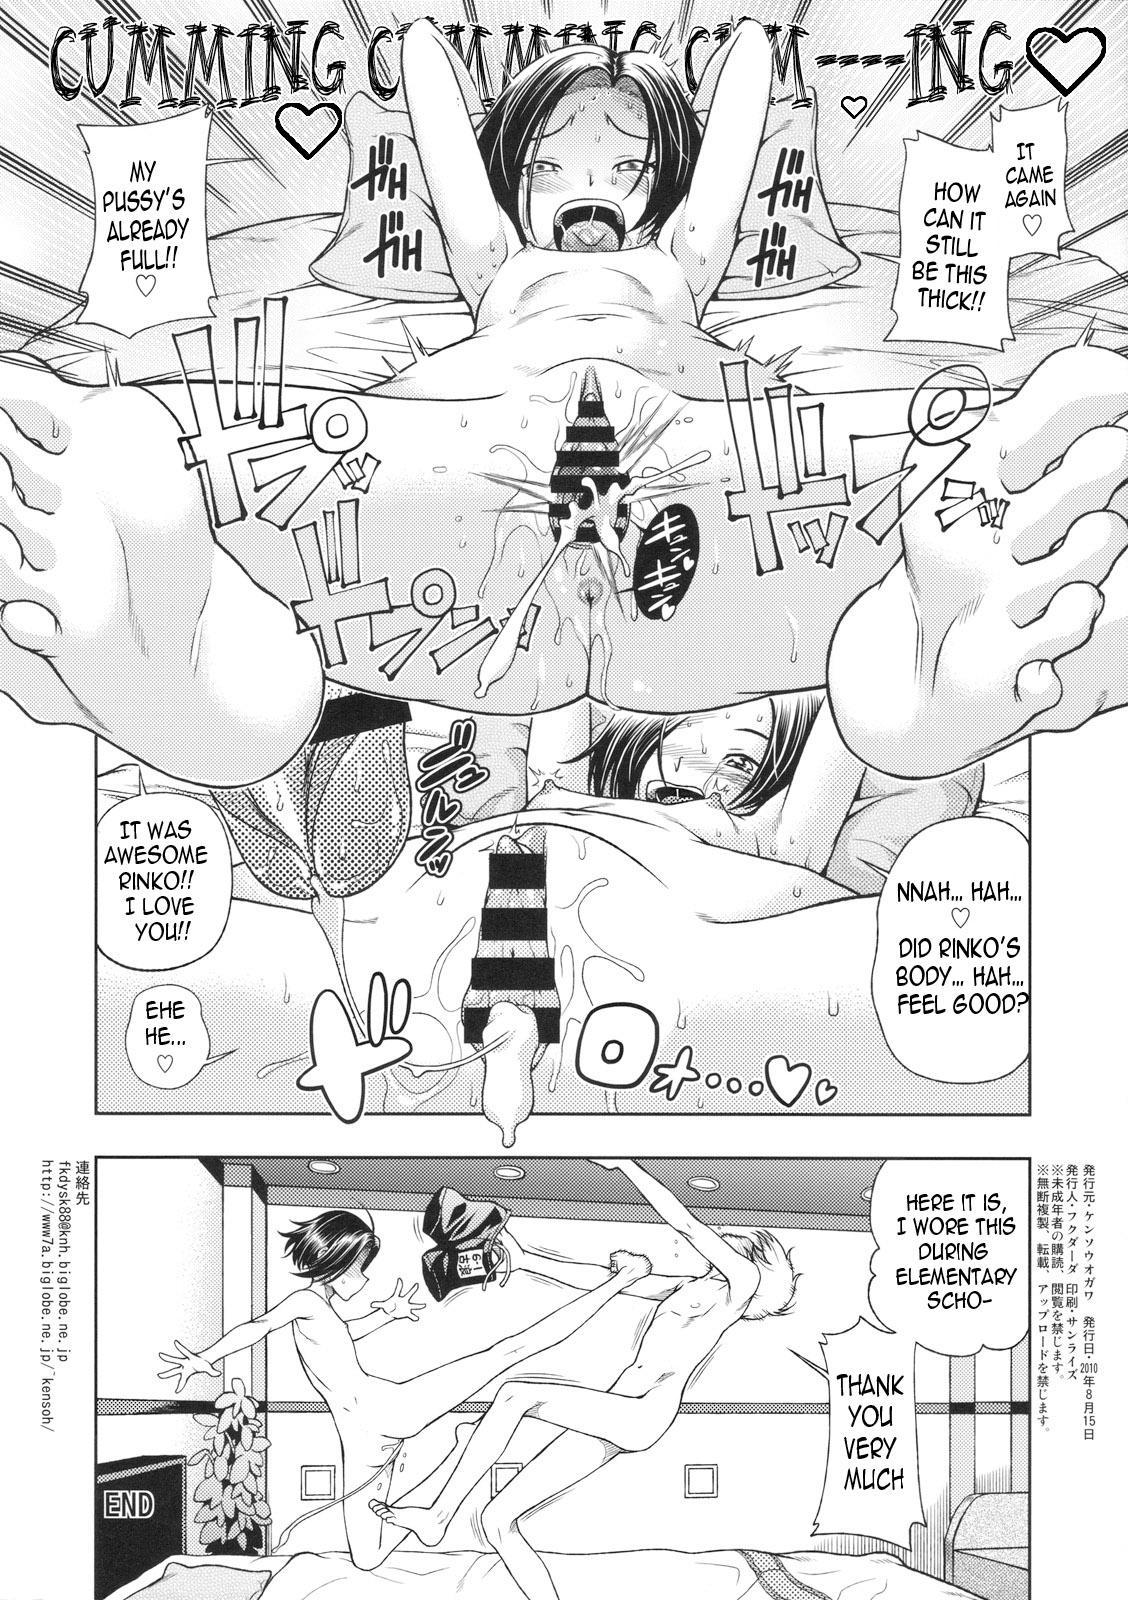 Manatsu + Manaka + Omake 32